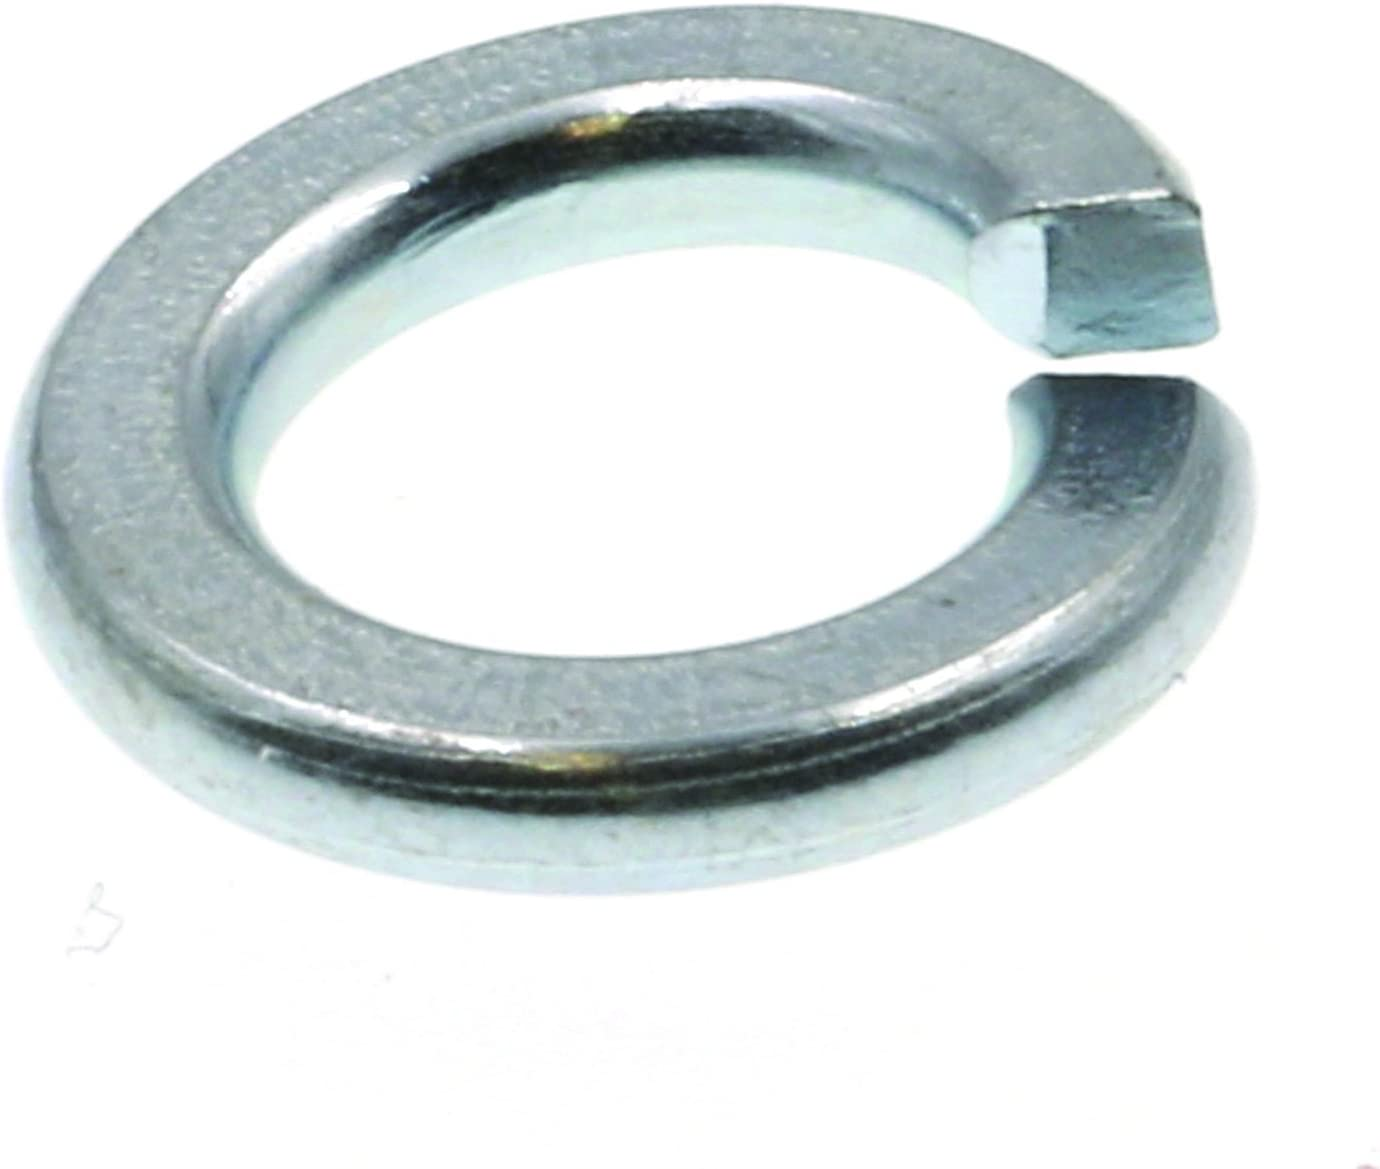 #10 Prime-Line 9081906 Medium Split Lock Washers 50-Pack Zinc Plated Steel